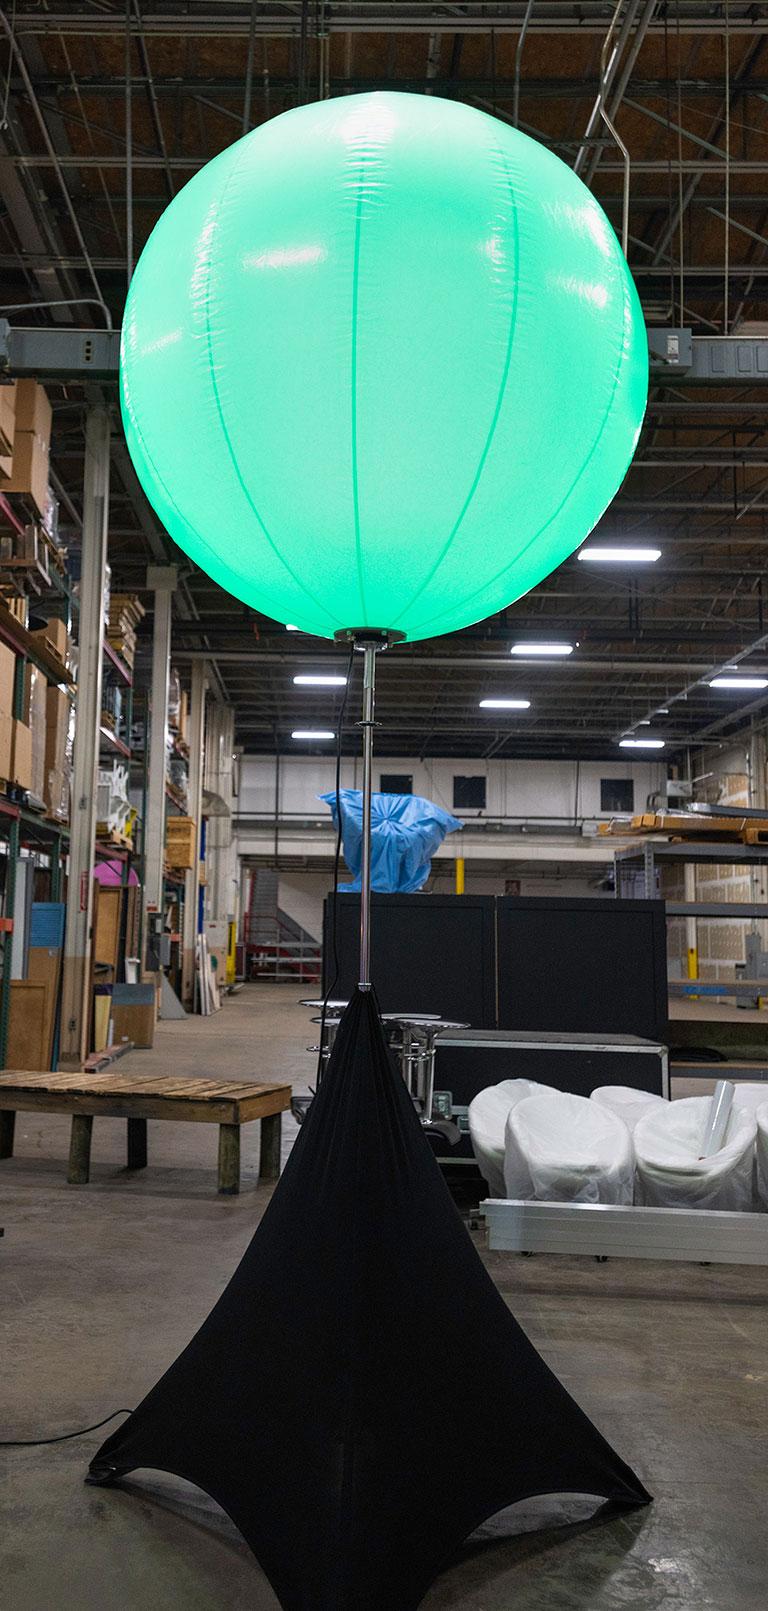 Airstar balloon Gary Musick Event Lighting